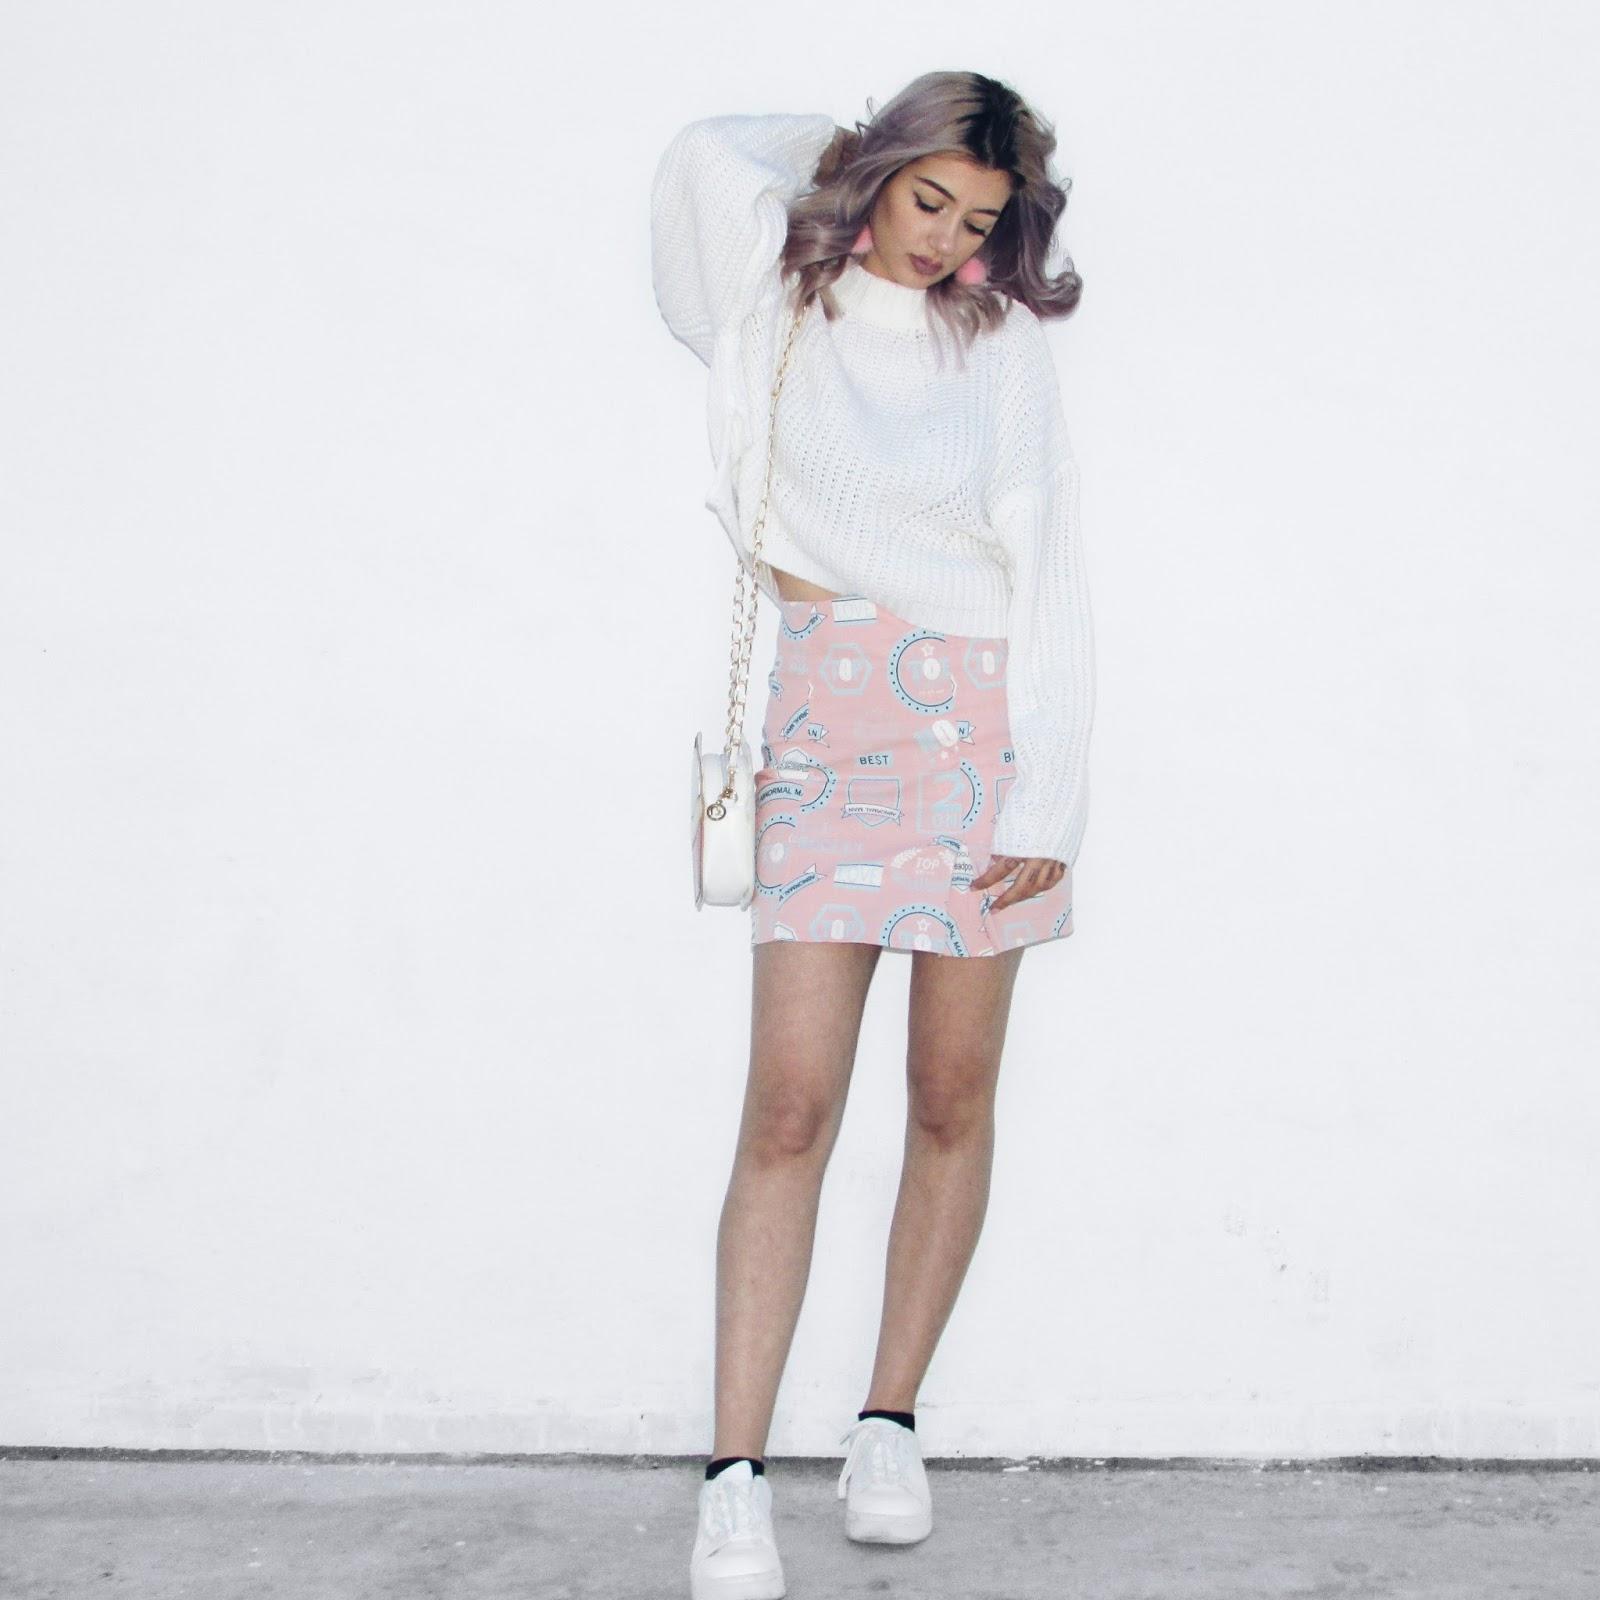 pink skirt street style